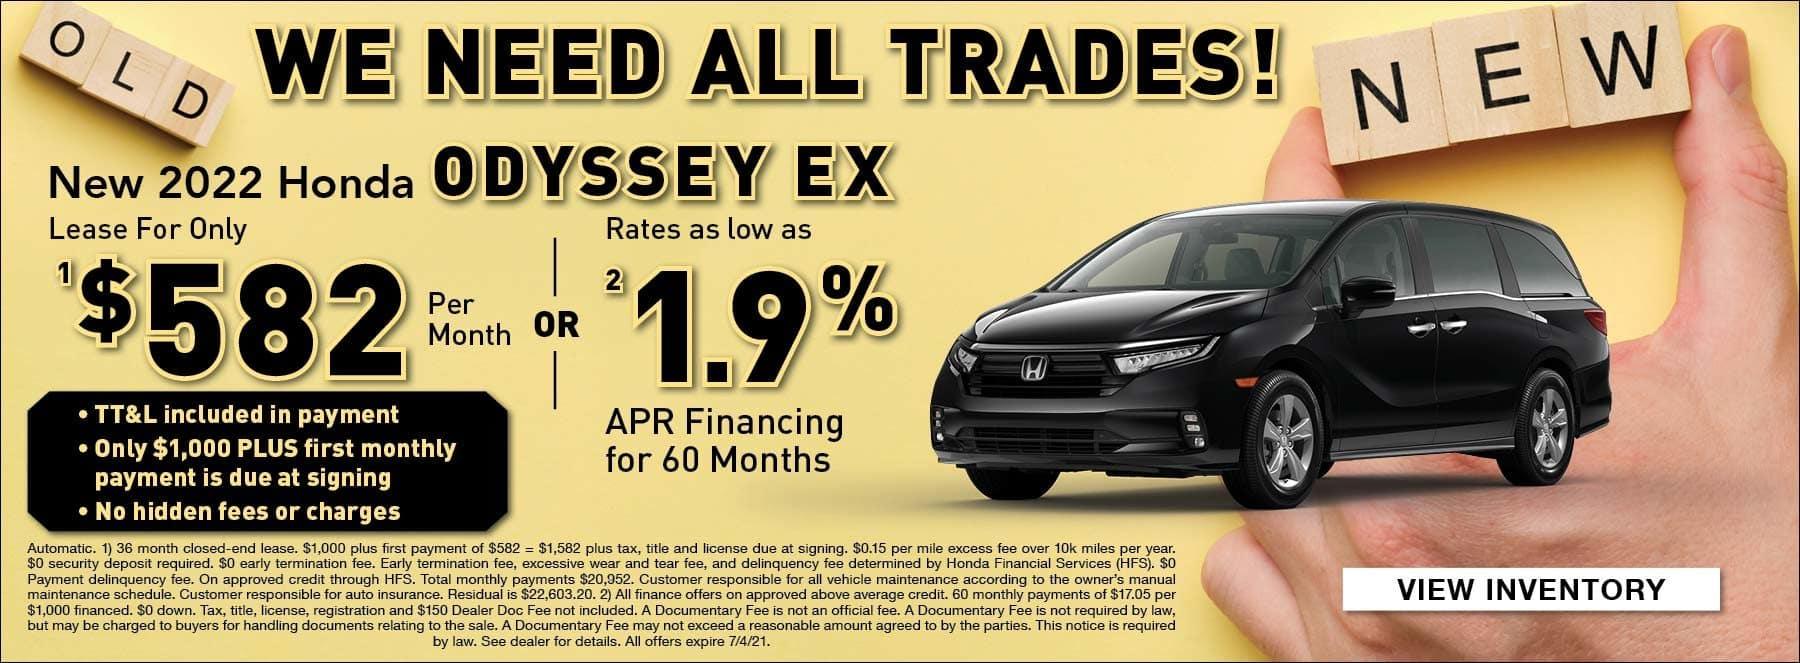 Odyssey EX